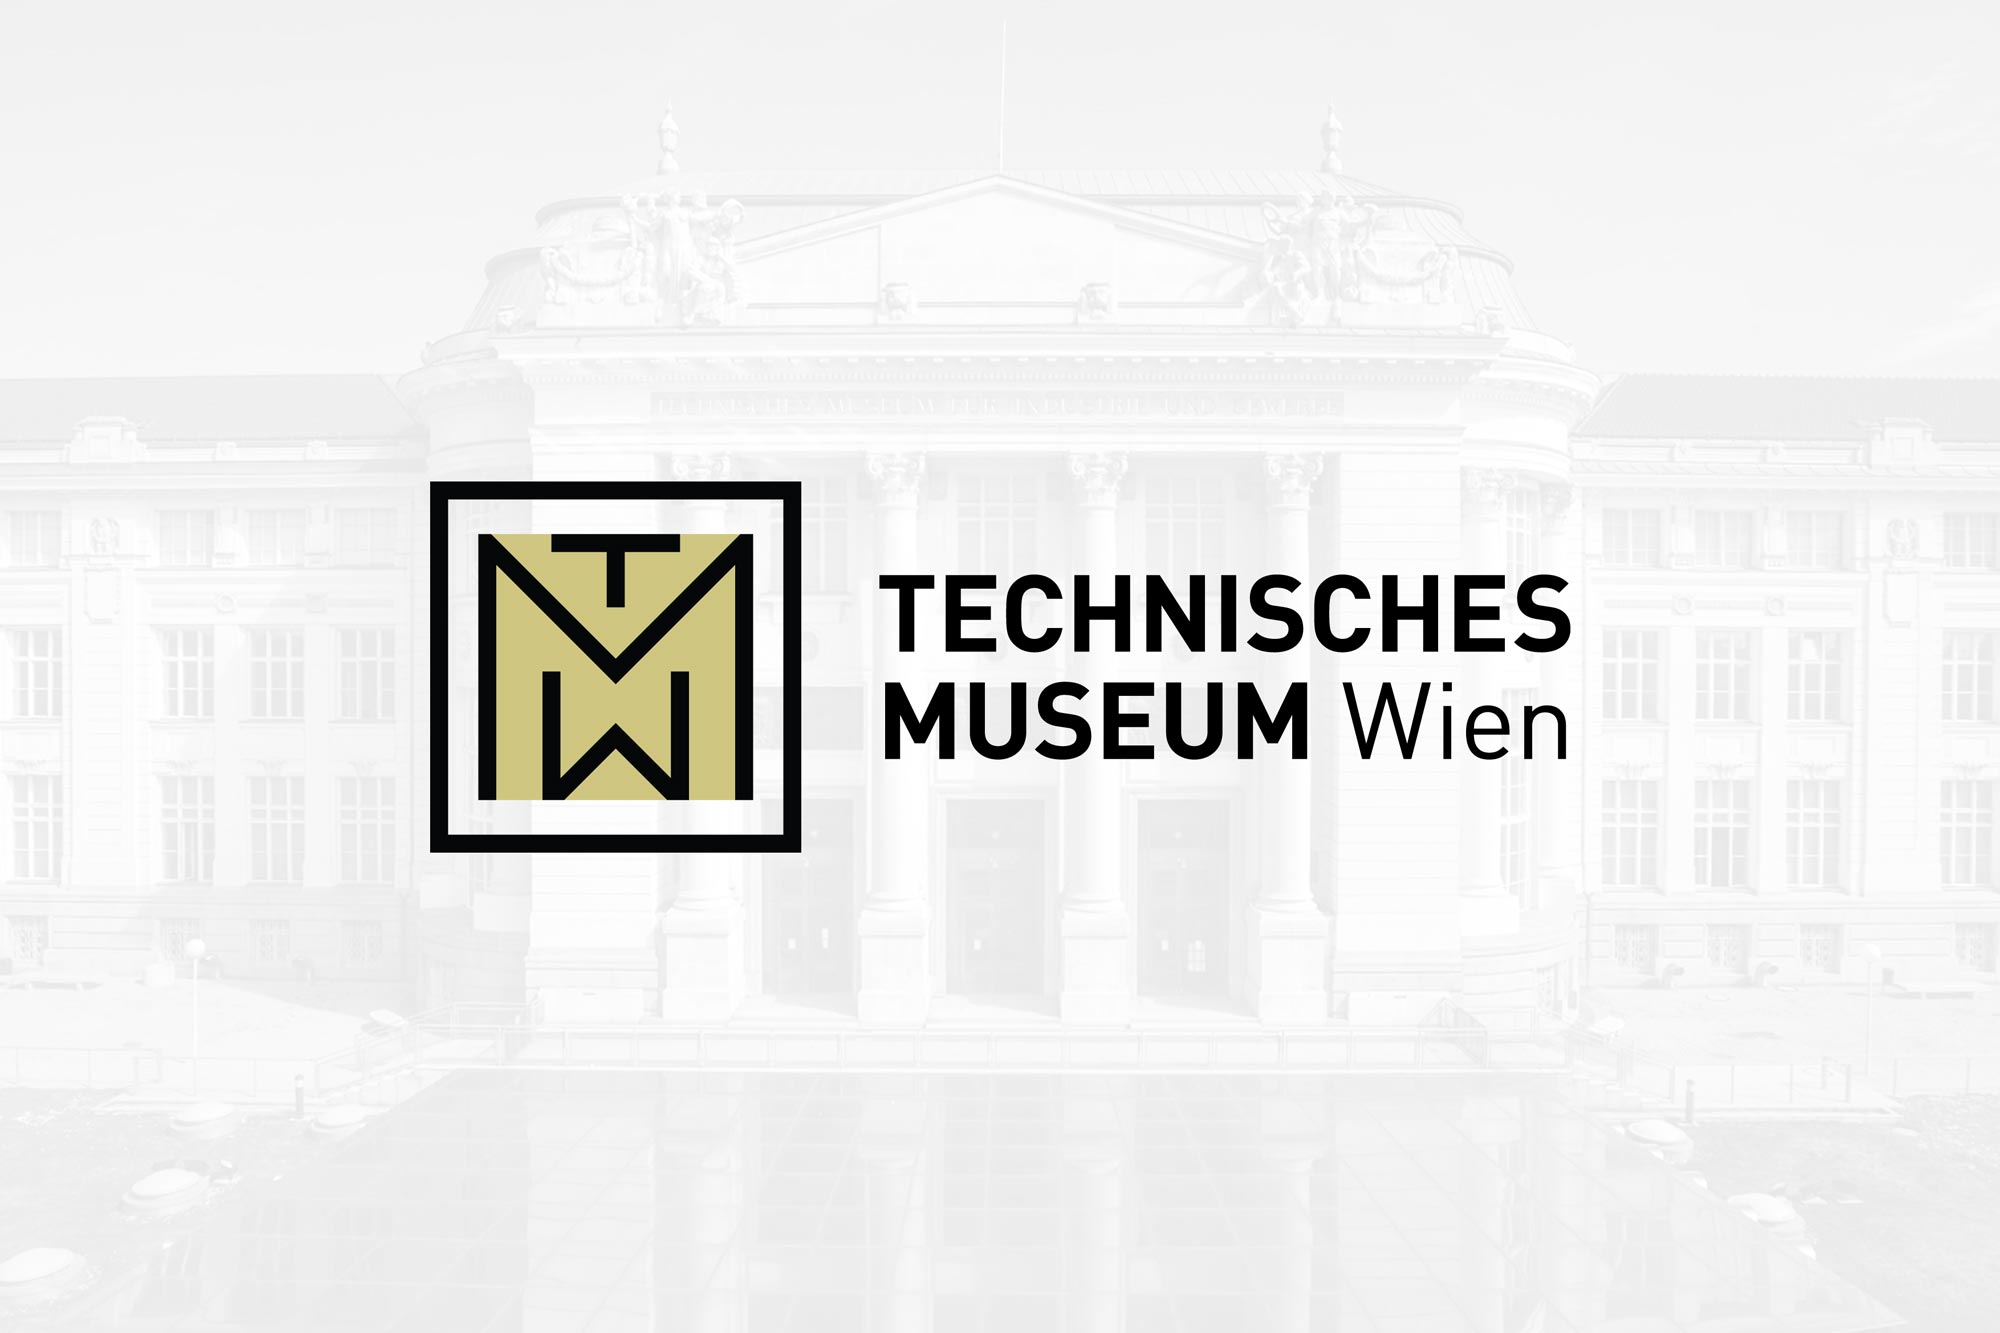 museum logo design services